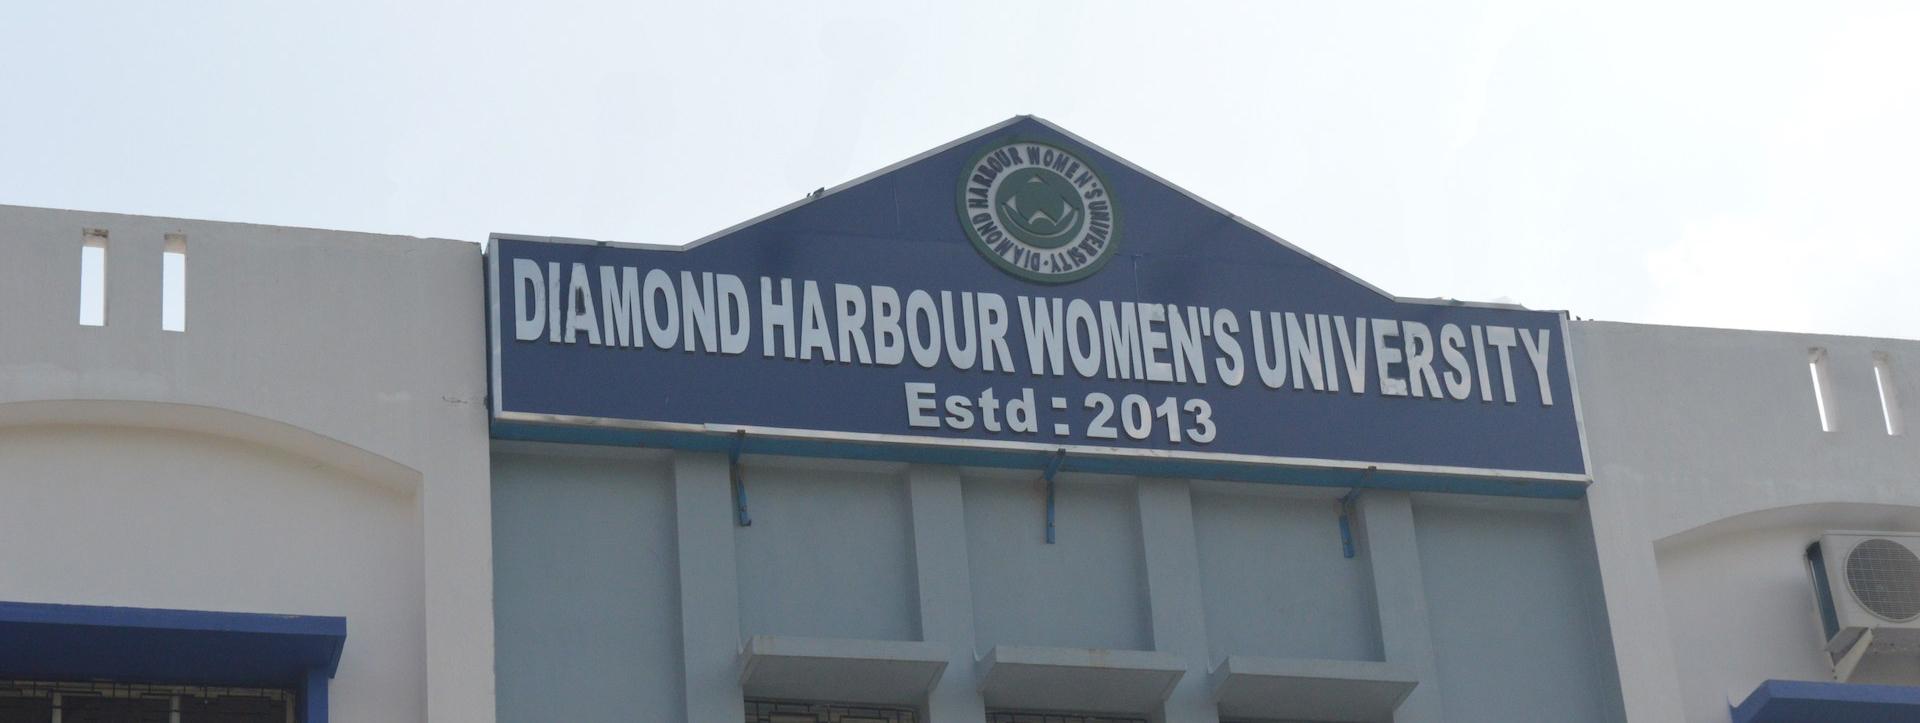 Diamond Harbour Women's University Image